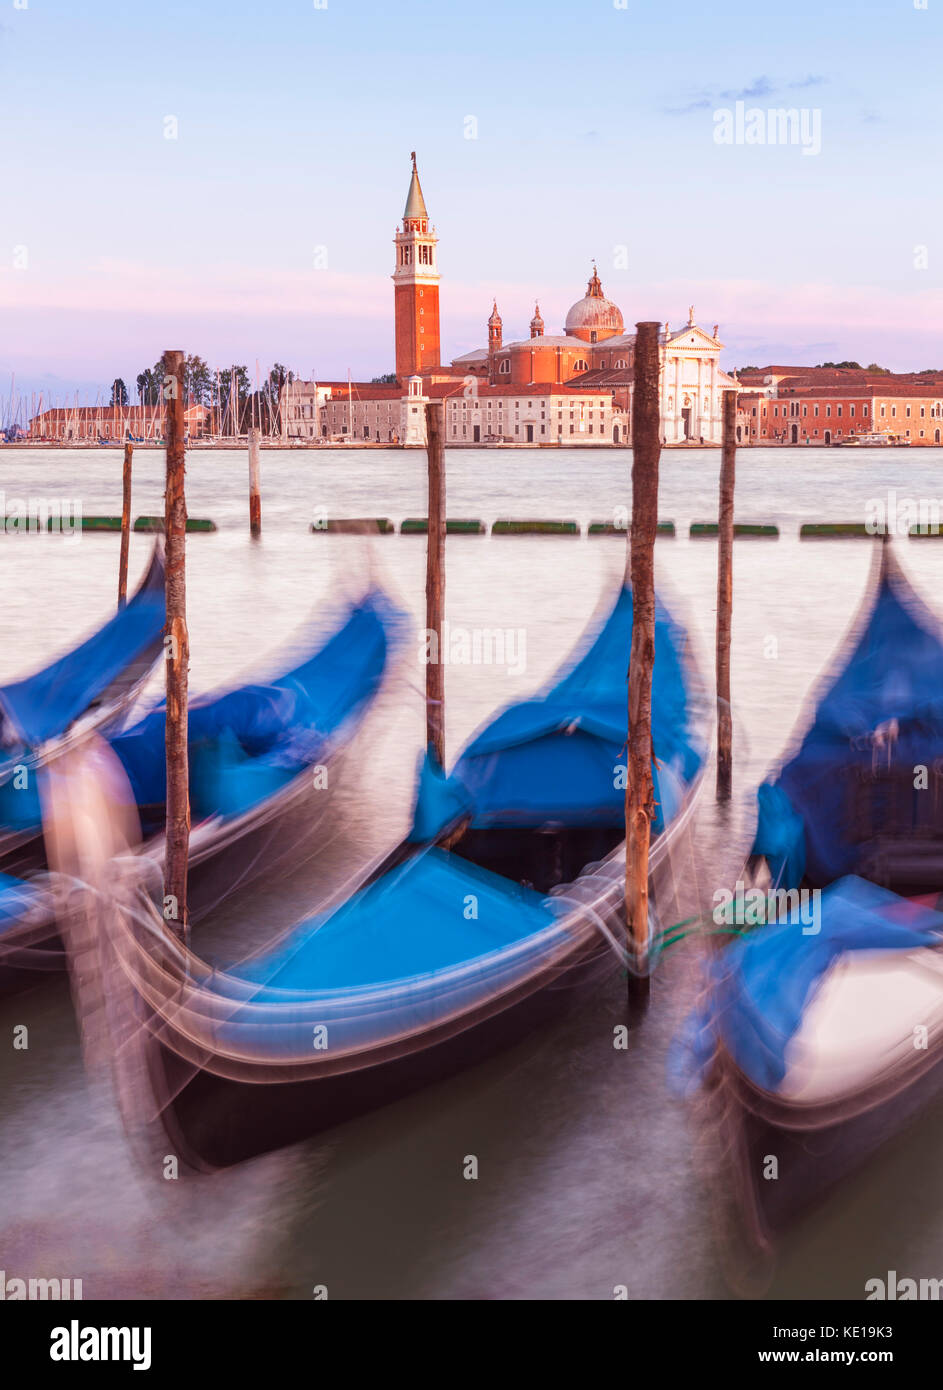 Italien Venedig Italien günstig Gondeln auf dem Canal Grande Venedig gegenüber der Insel San Giorgio Maggiore Stockbild